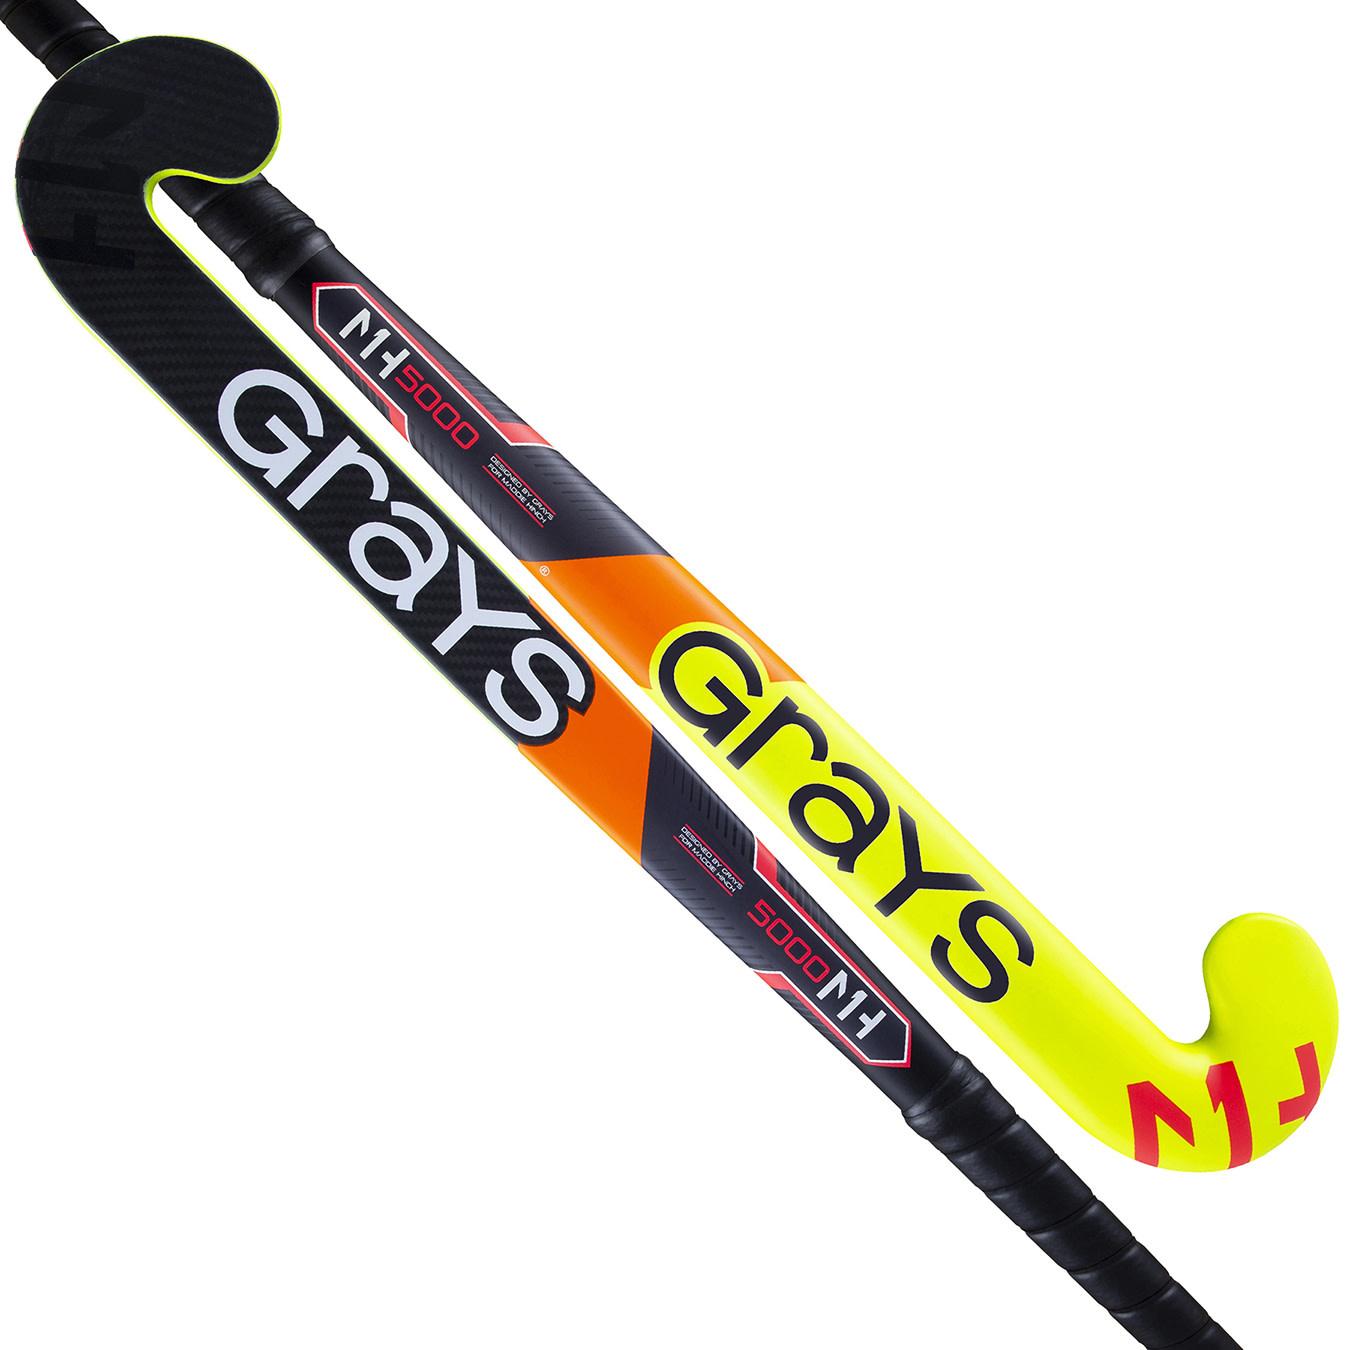 Grays MH1 UB GK5000 Neon Yellow/Black goaliestick, order now!